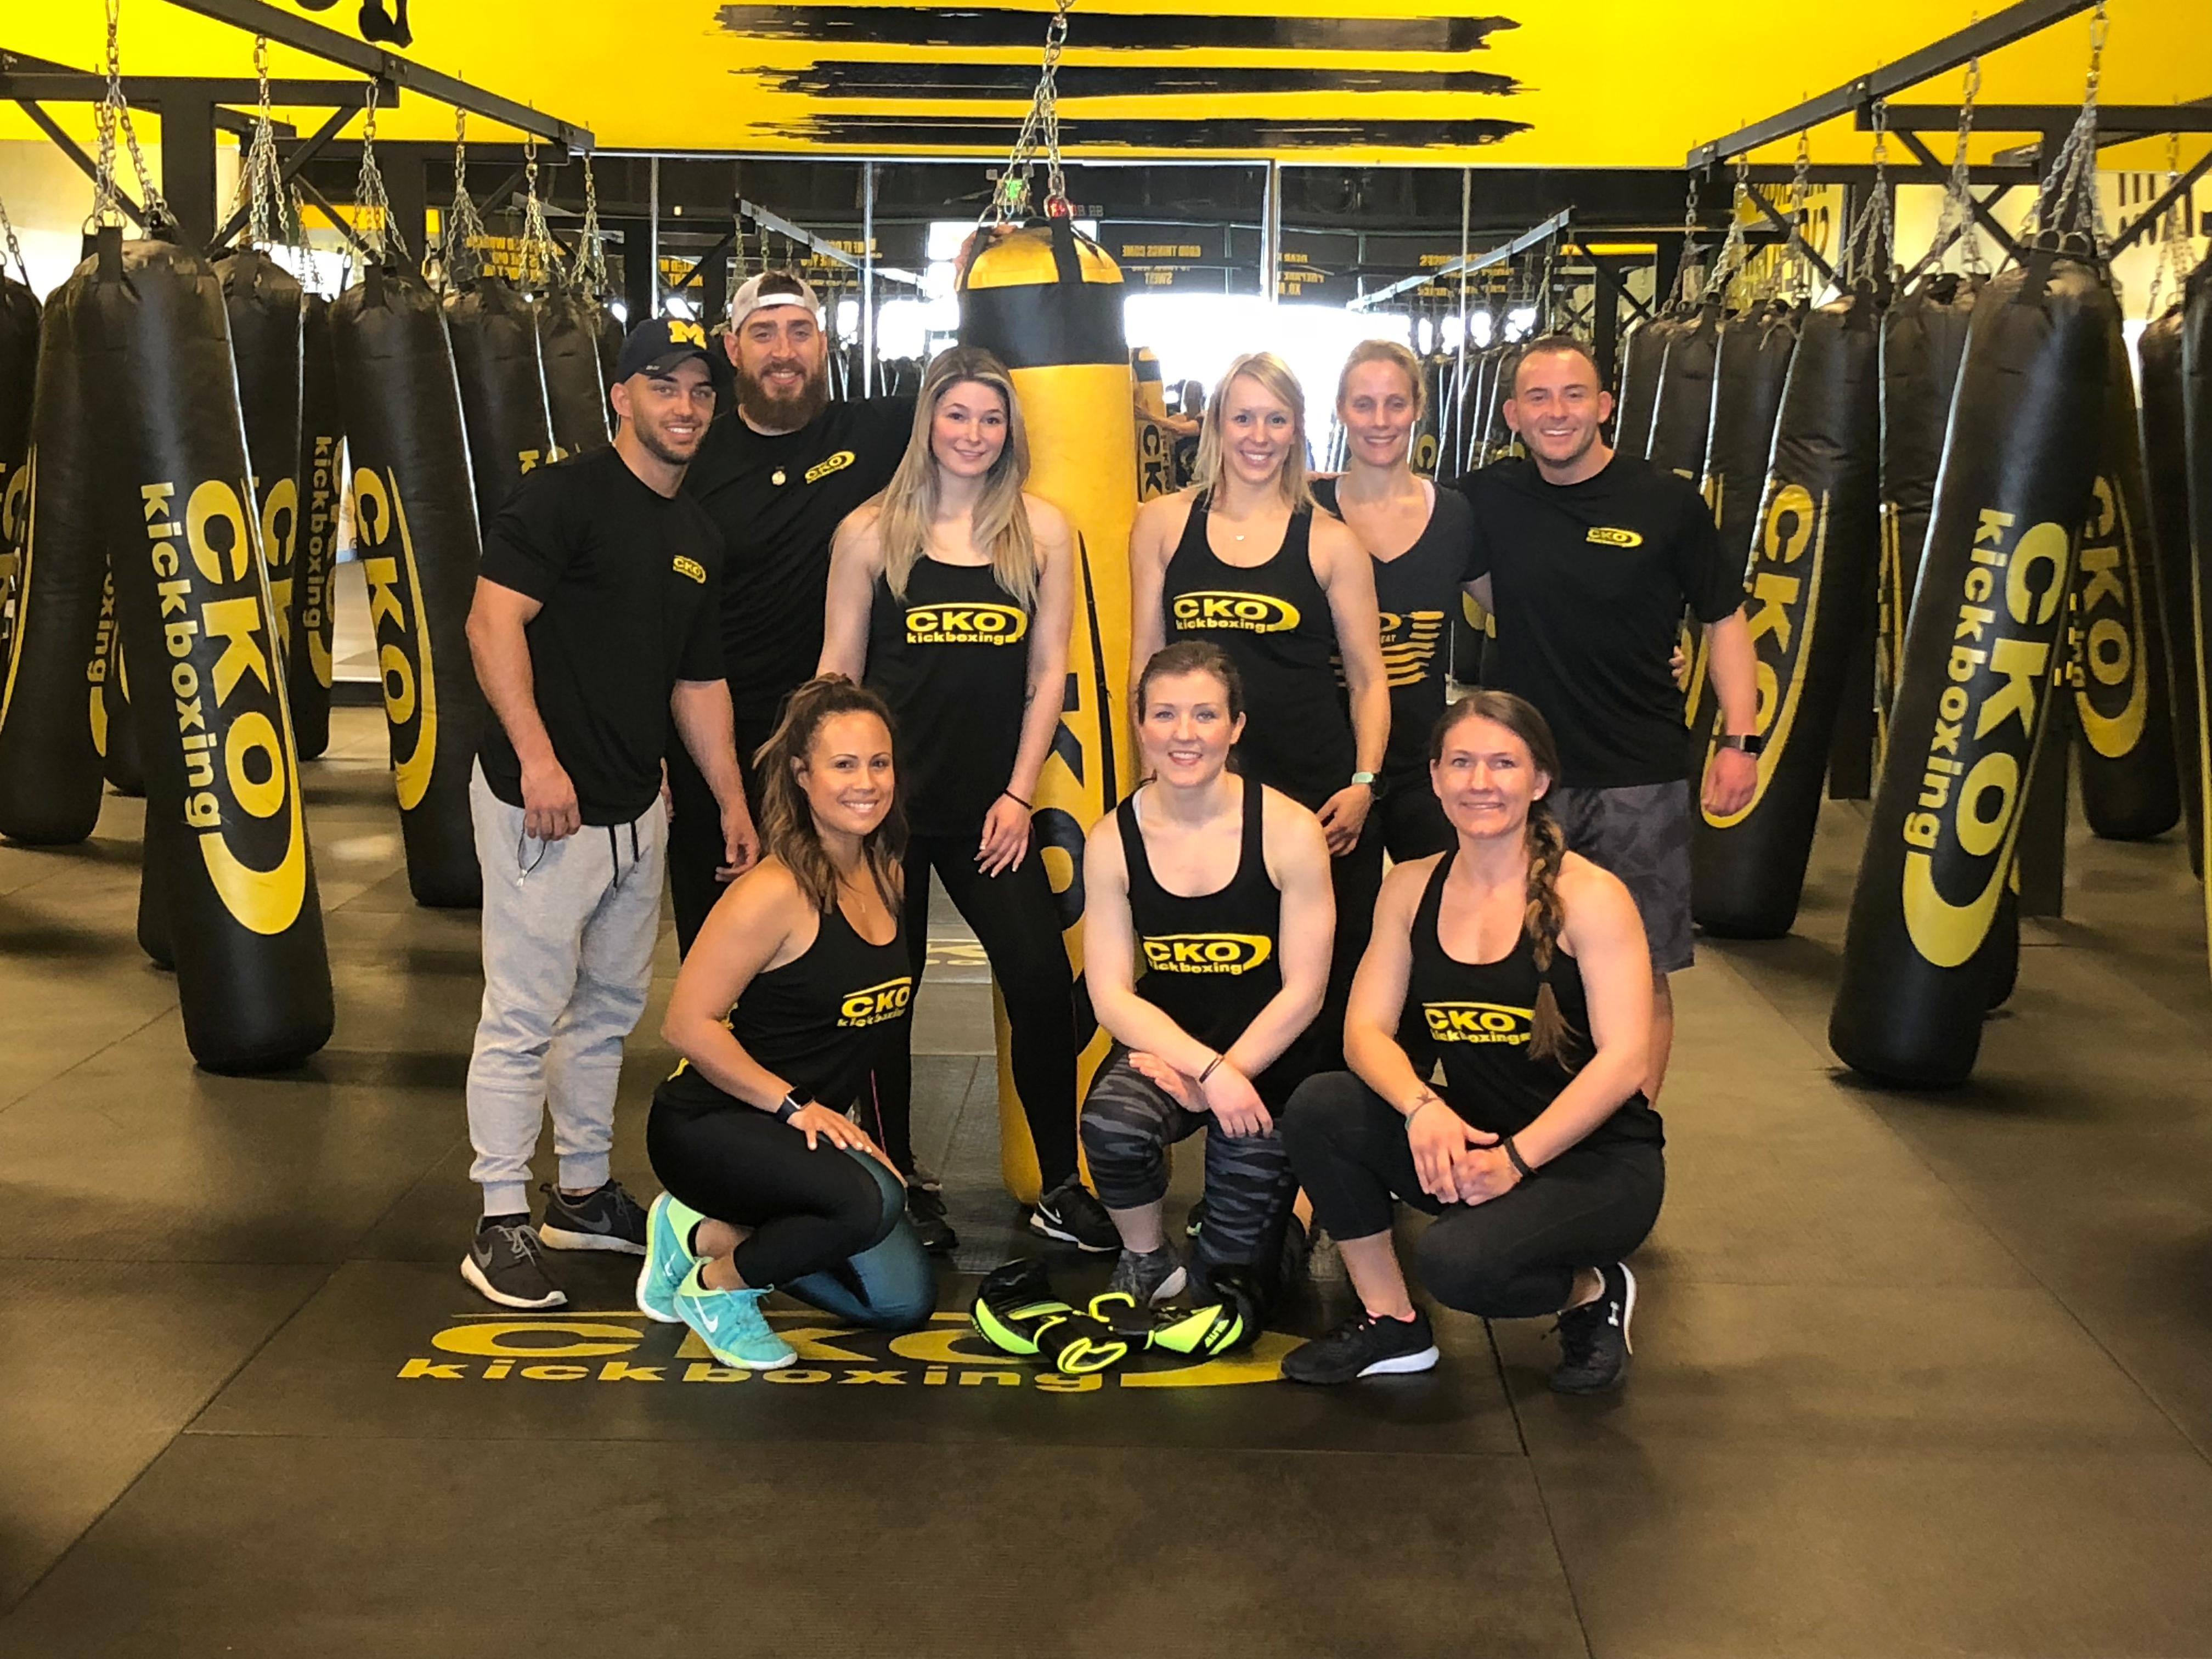 CKO Kickboxing 271 Route 22 Springfield Township, NJ Exercise